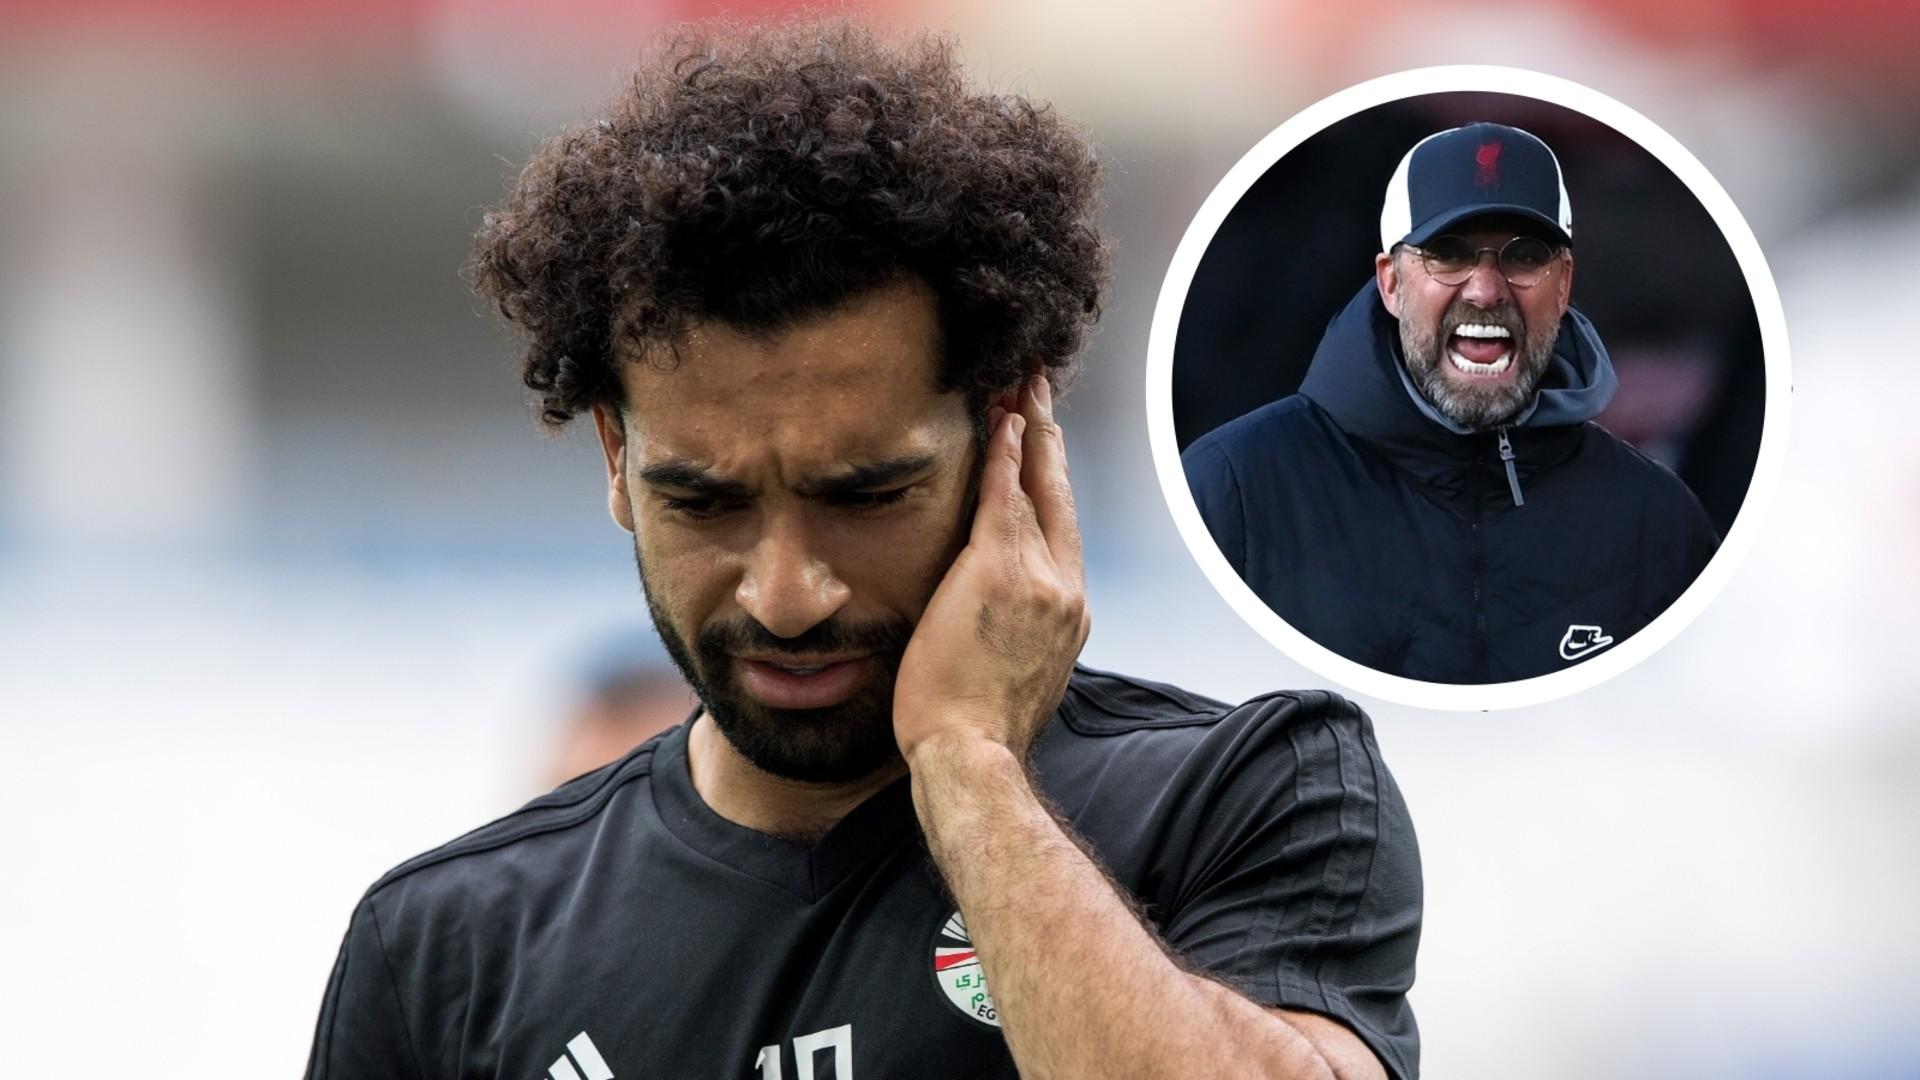 No Salah, no Elneny as Egypt confirm 22-man squad for Olympic Games